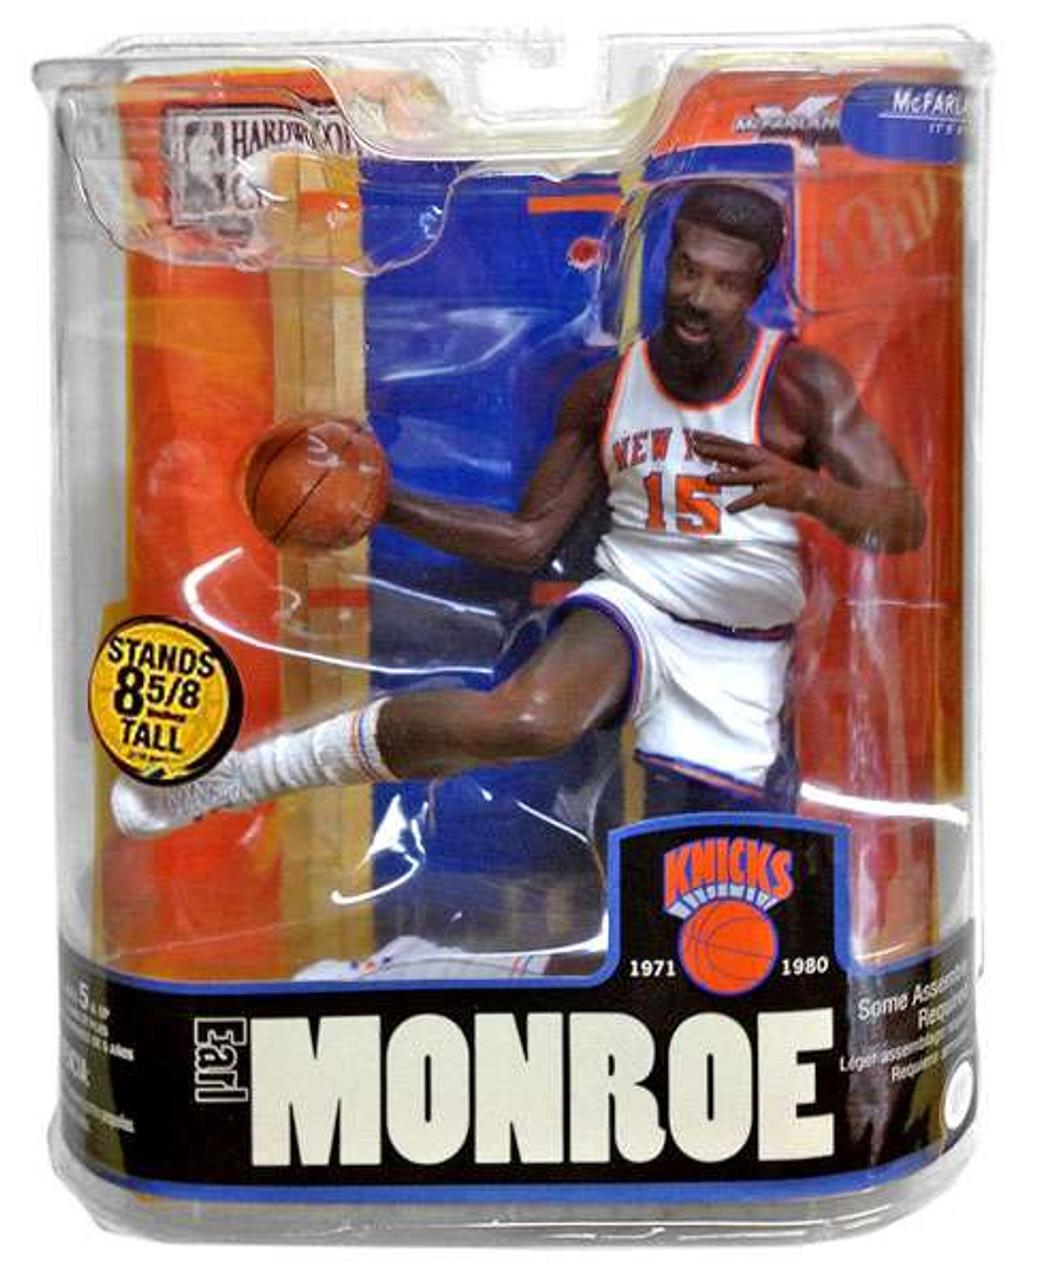 buy online 80004 03cb7 McFarlane Toys NBA New York Knicks Sports Picks Legends Series 3 Earl  Monroe Action Figure